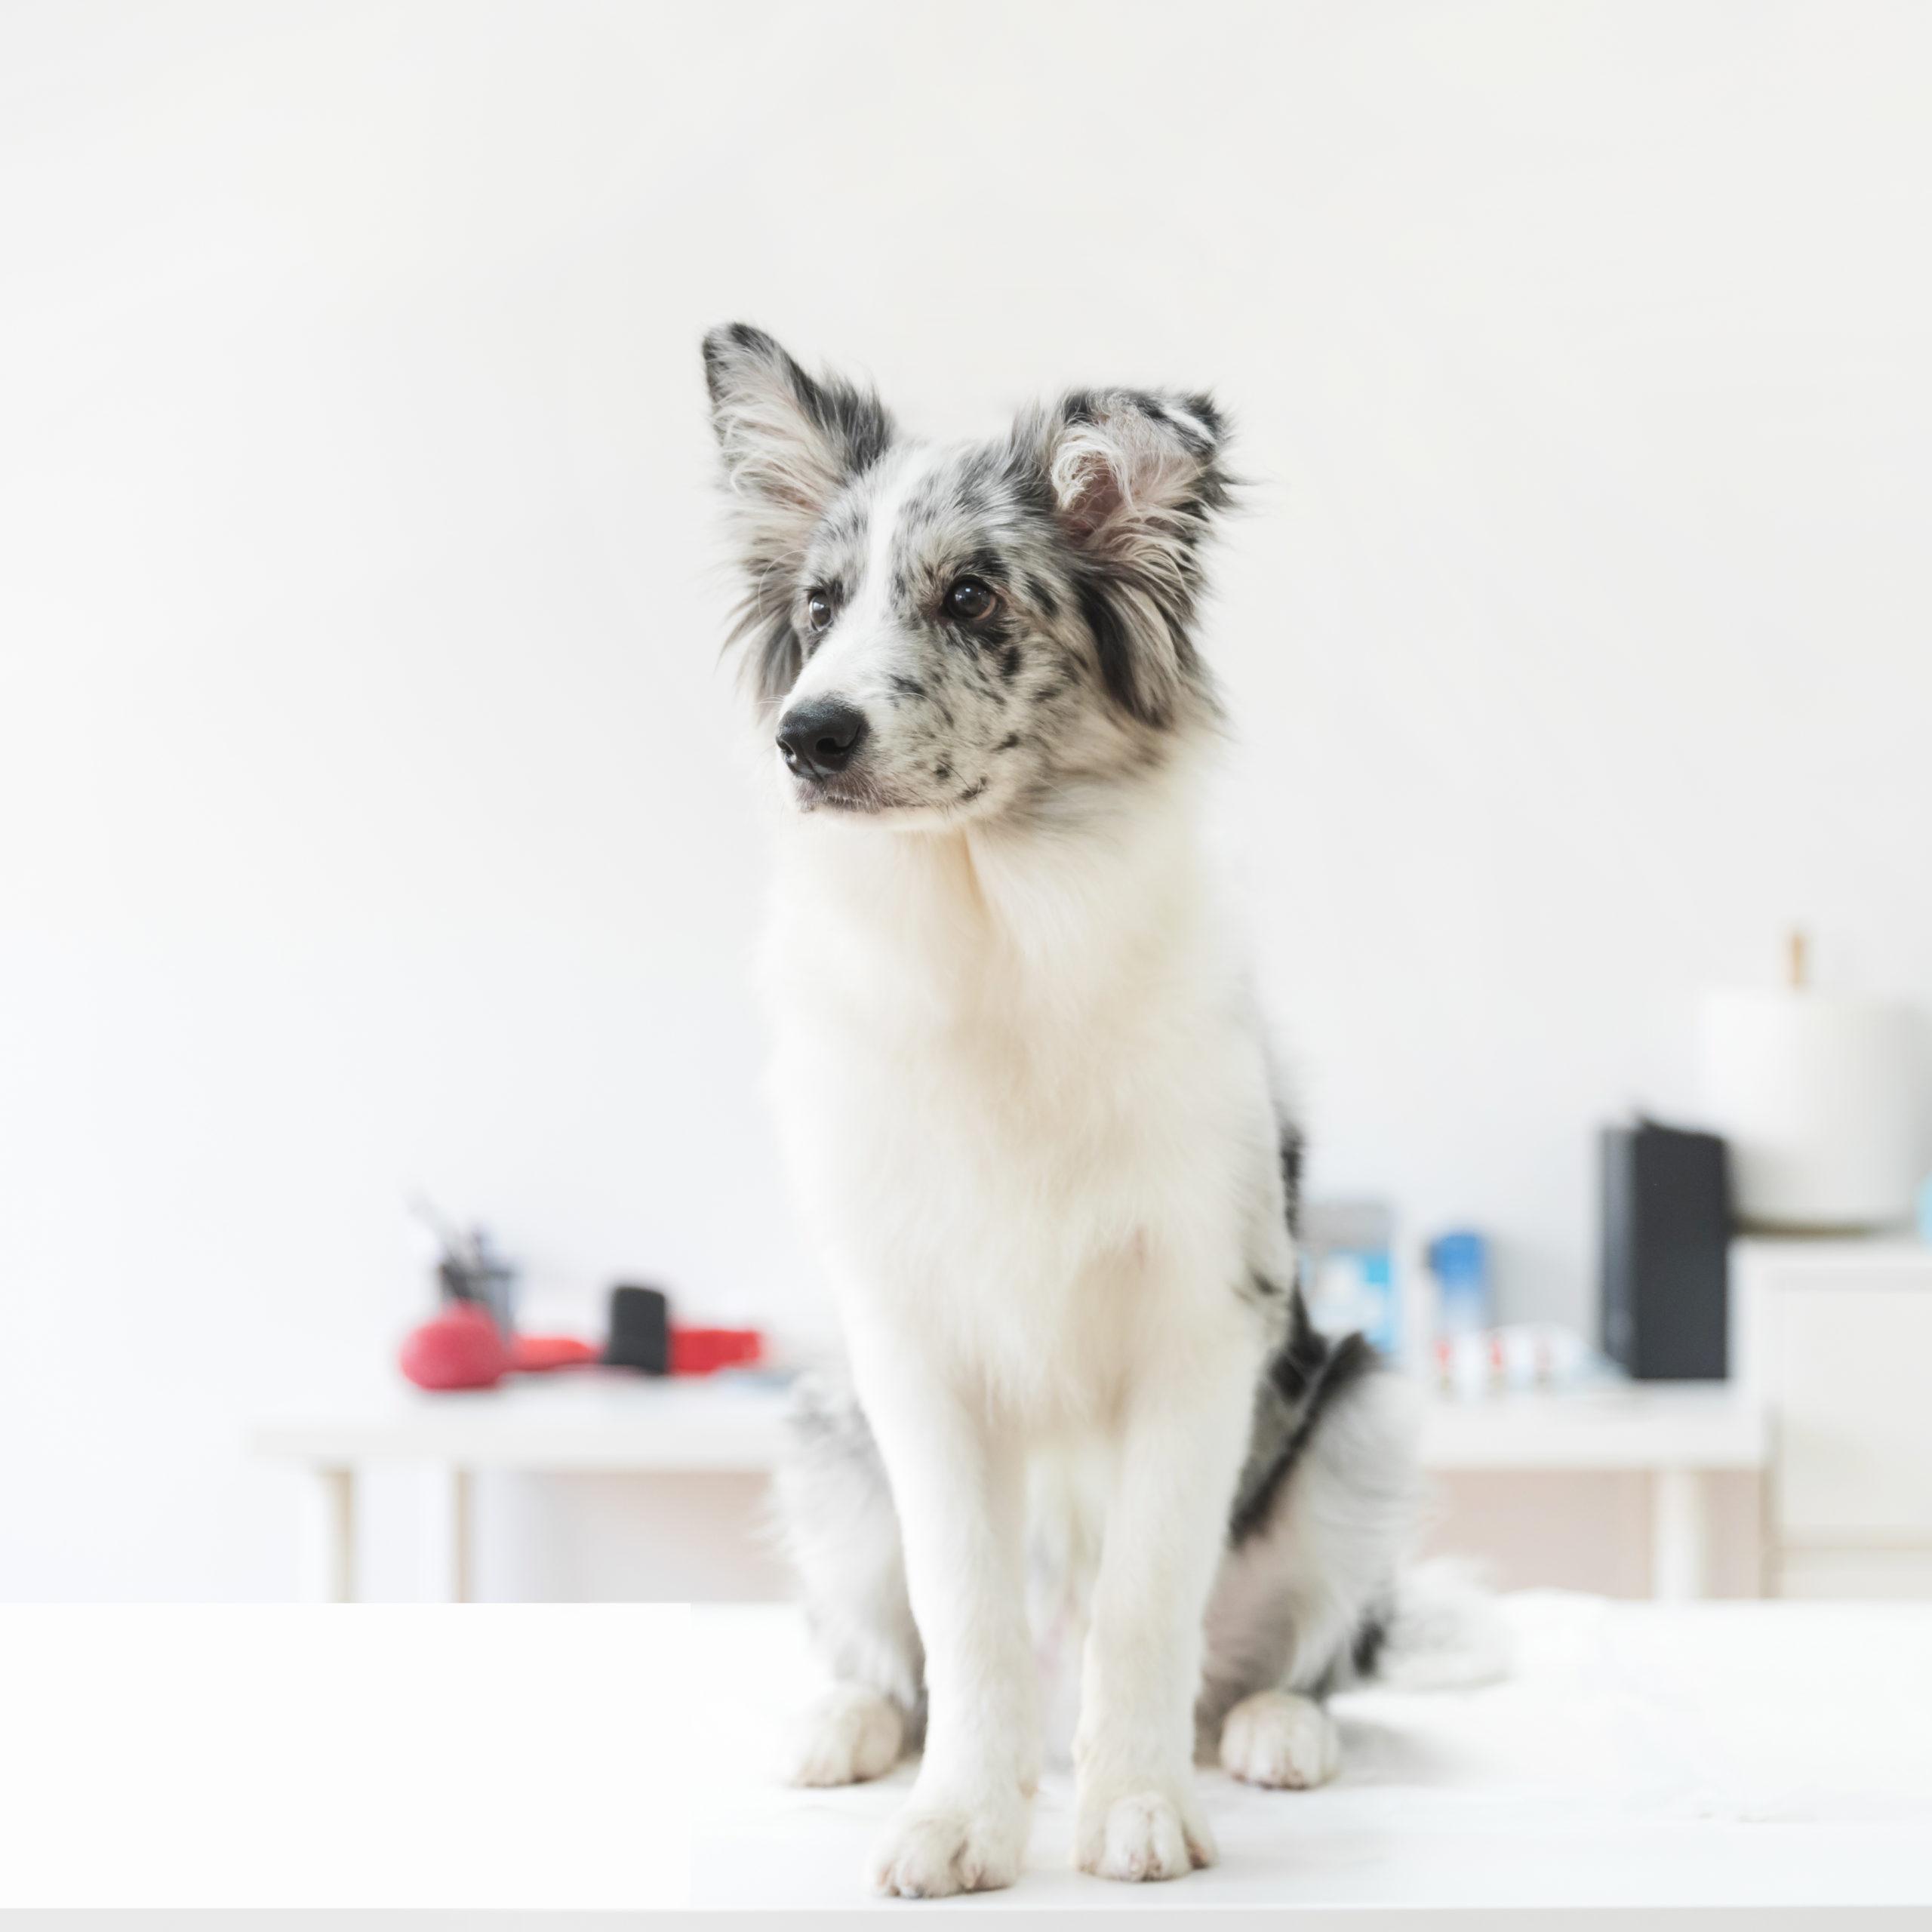 Tierarzt-Webinar-Pankreatitis-Hund